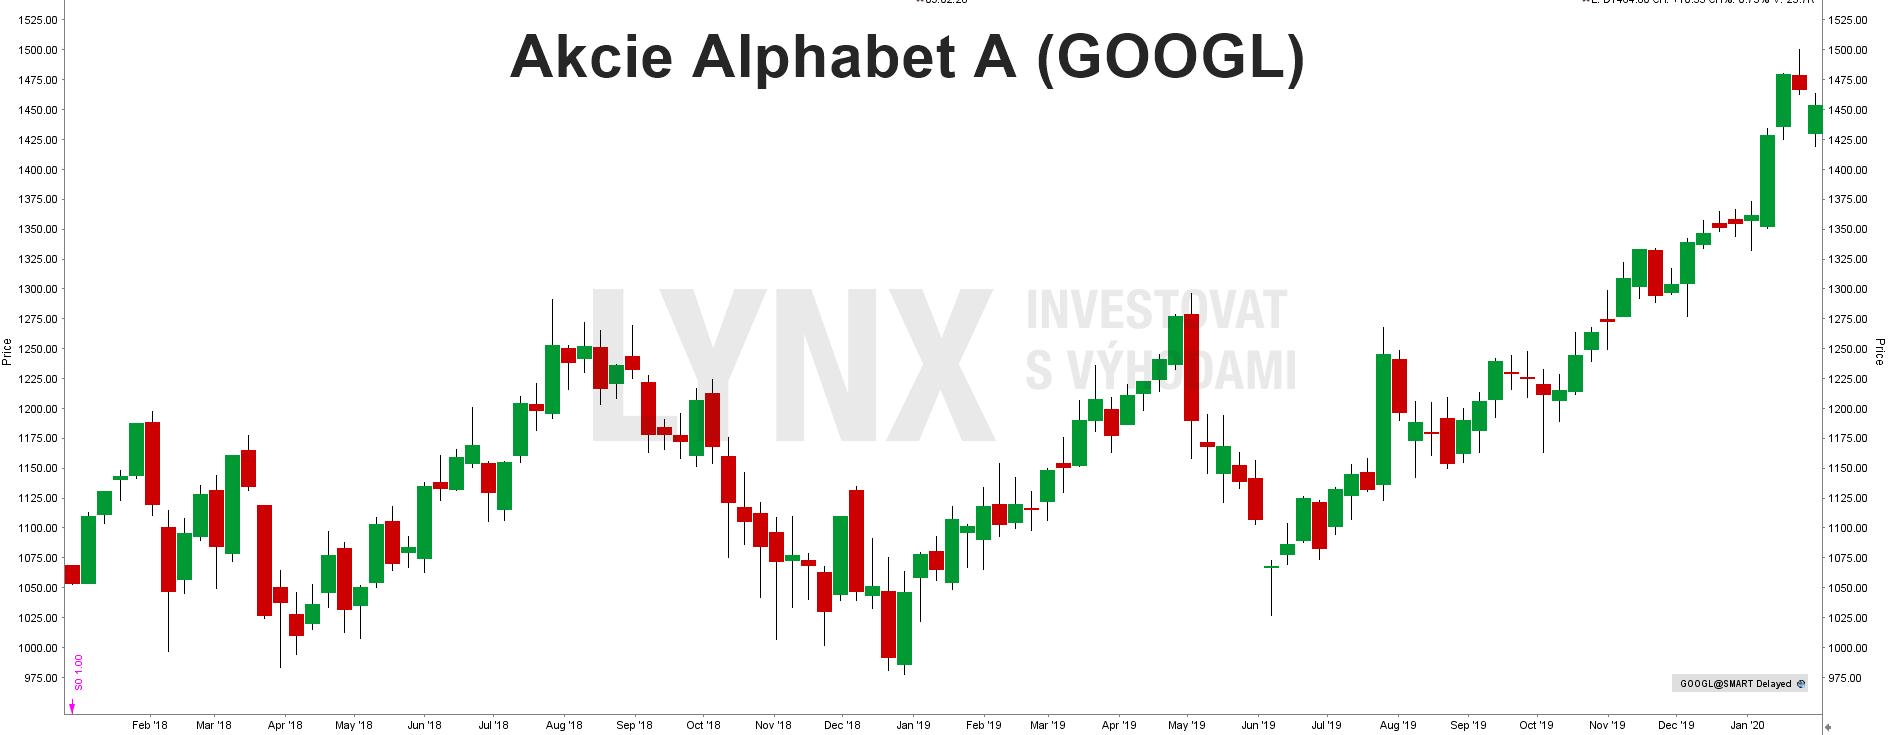 Akcie Alphabet A (Google)